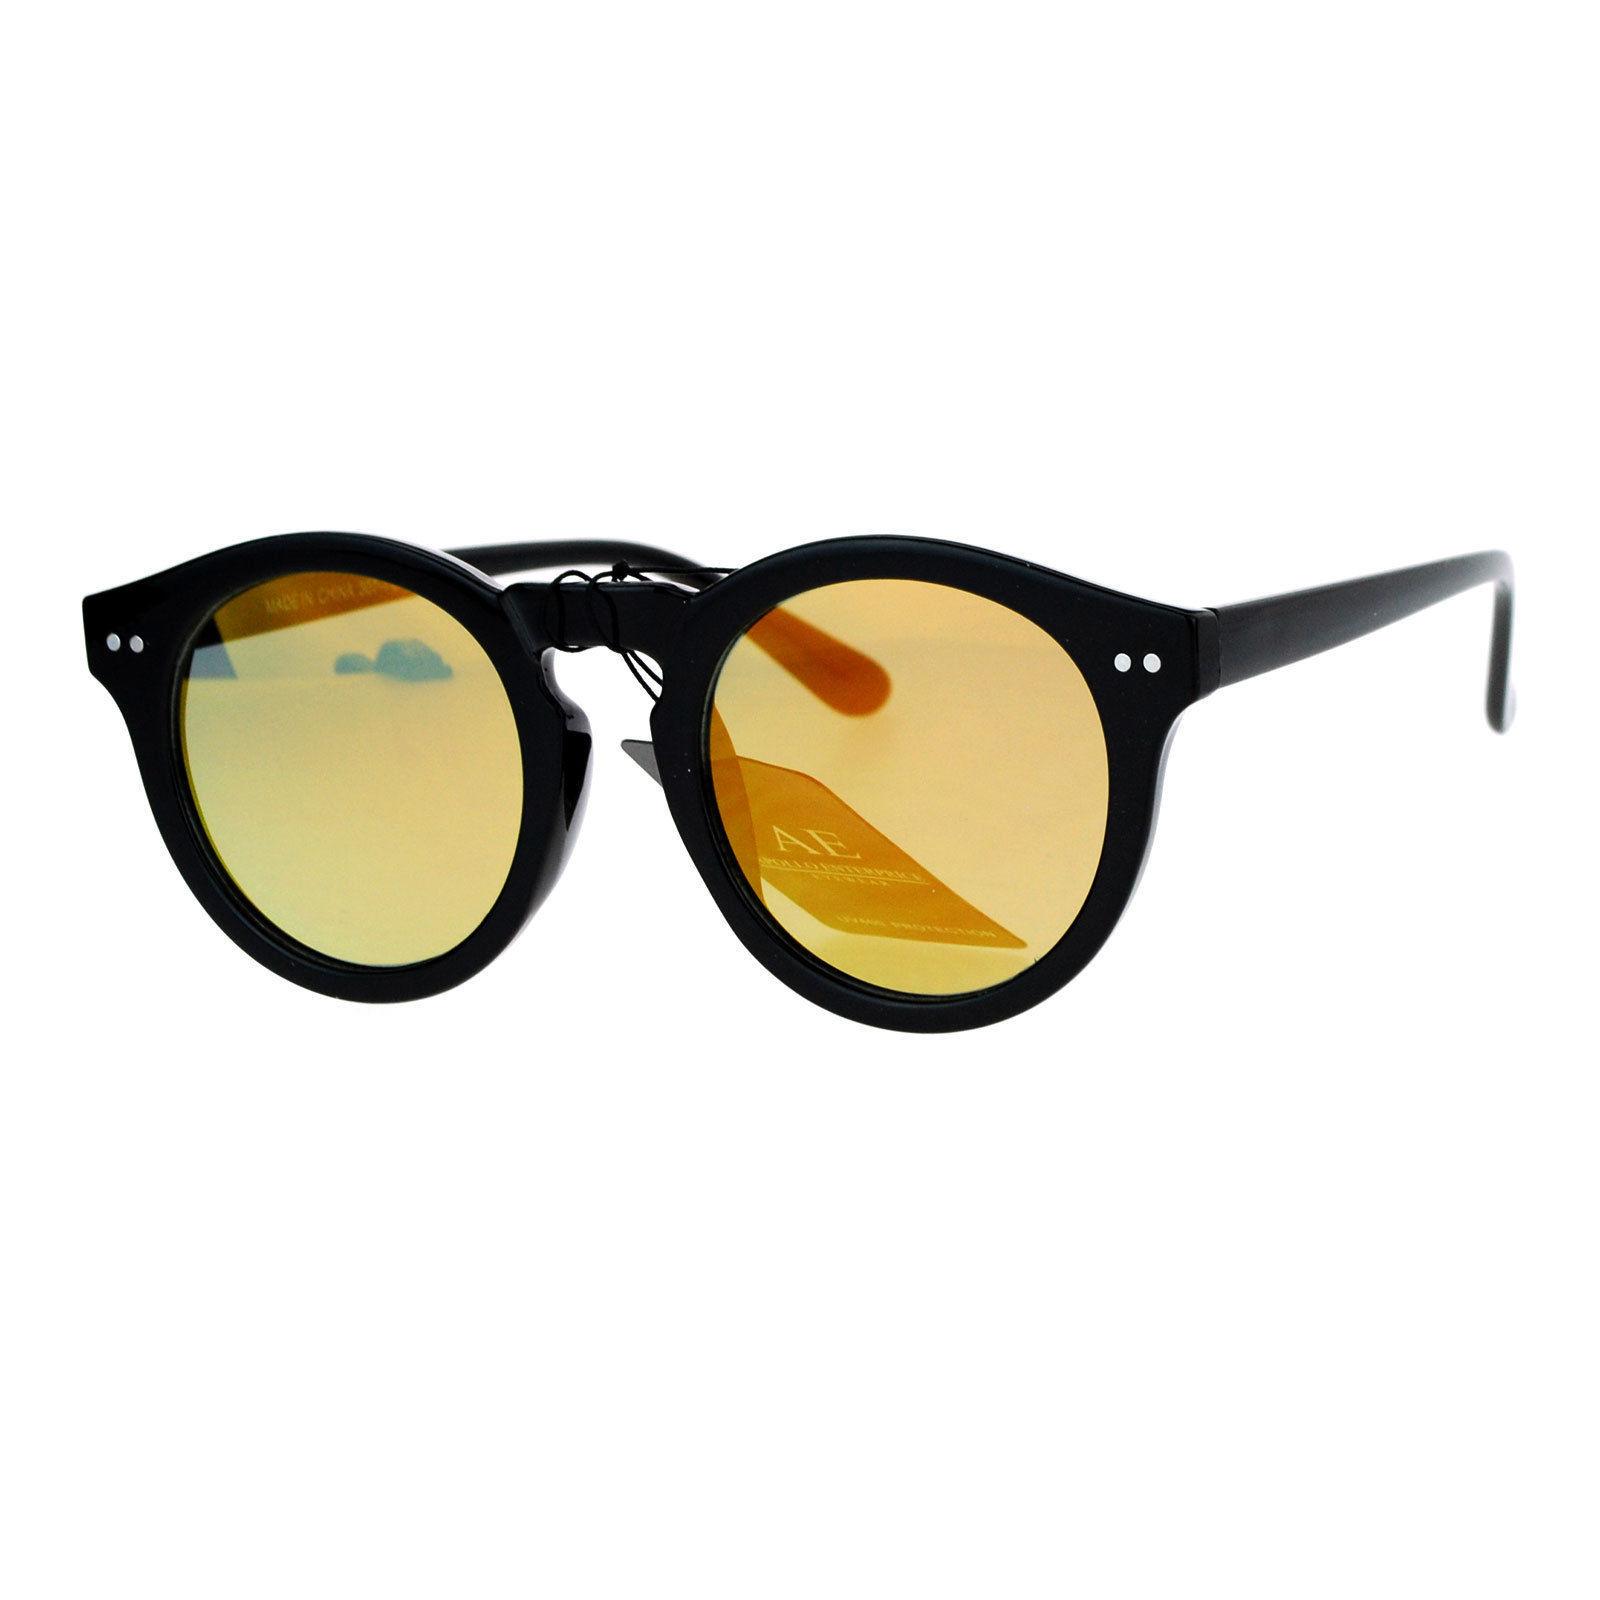 Unisex Fashion Sunglasses Black Round Keyhole Horn Rim Mirror Lens UV 400